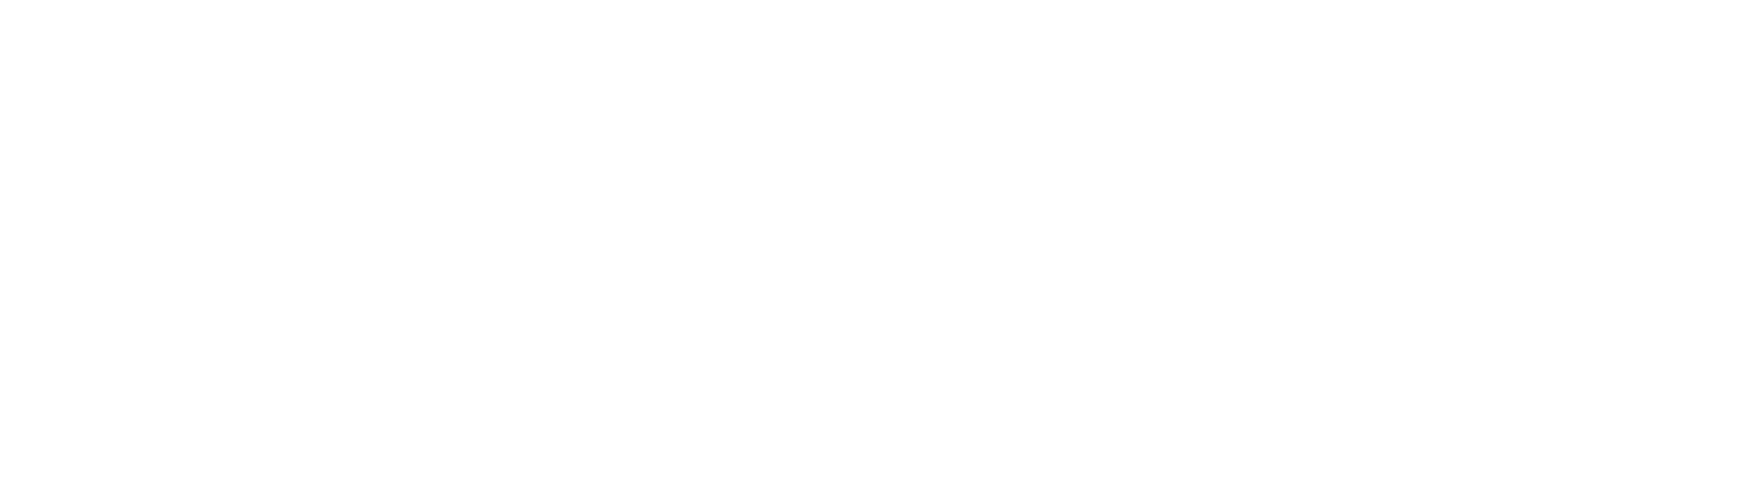 avaya_logo_white_500h